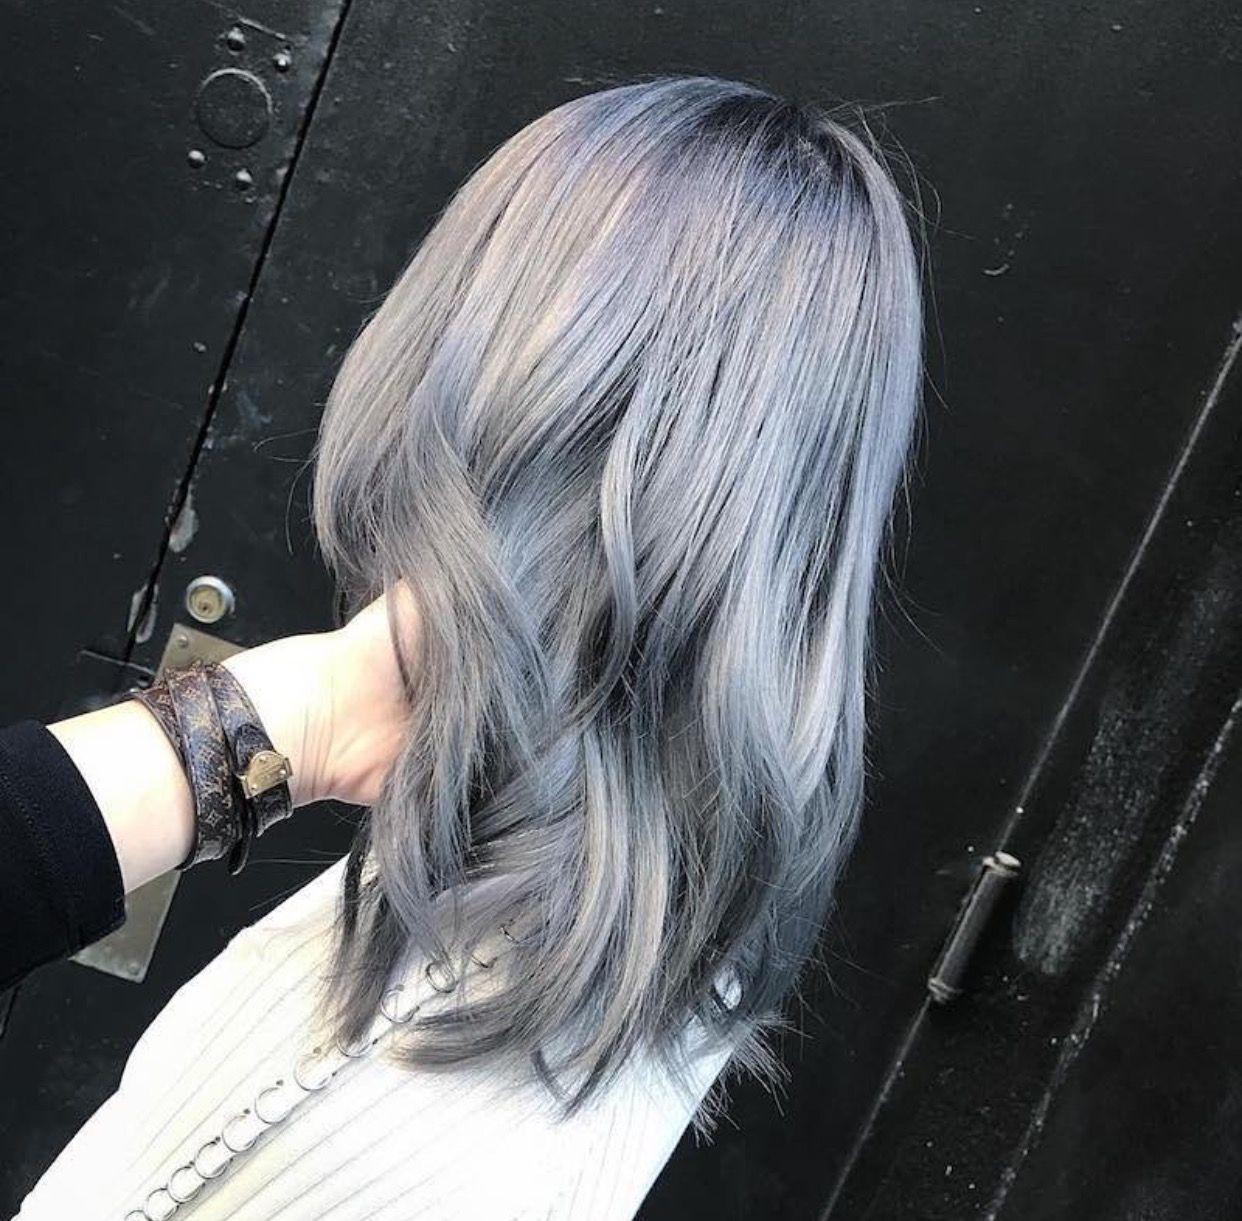 Pin by mary godoy on hair hair makeup hairdo adidas